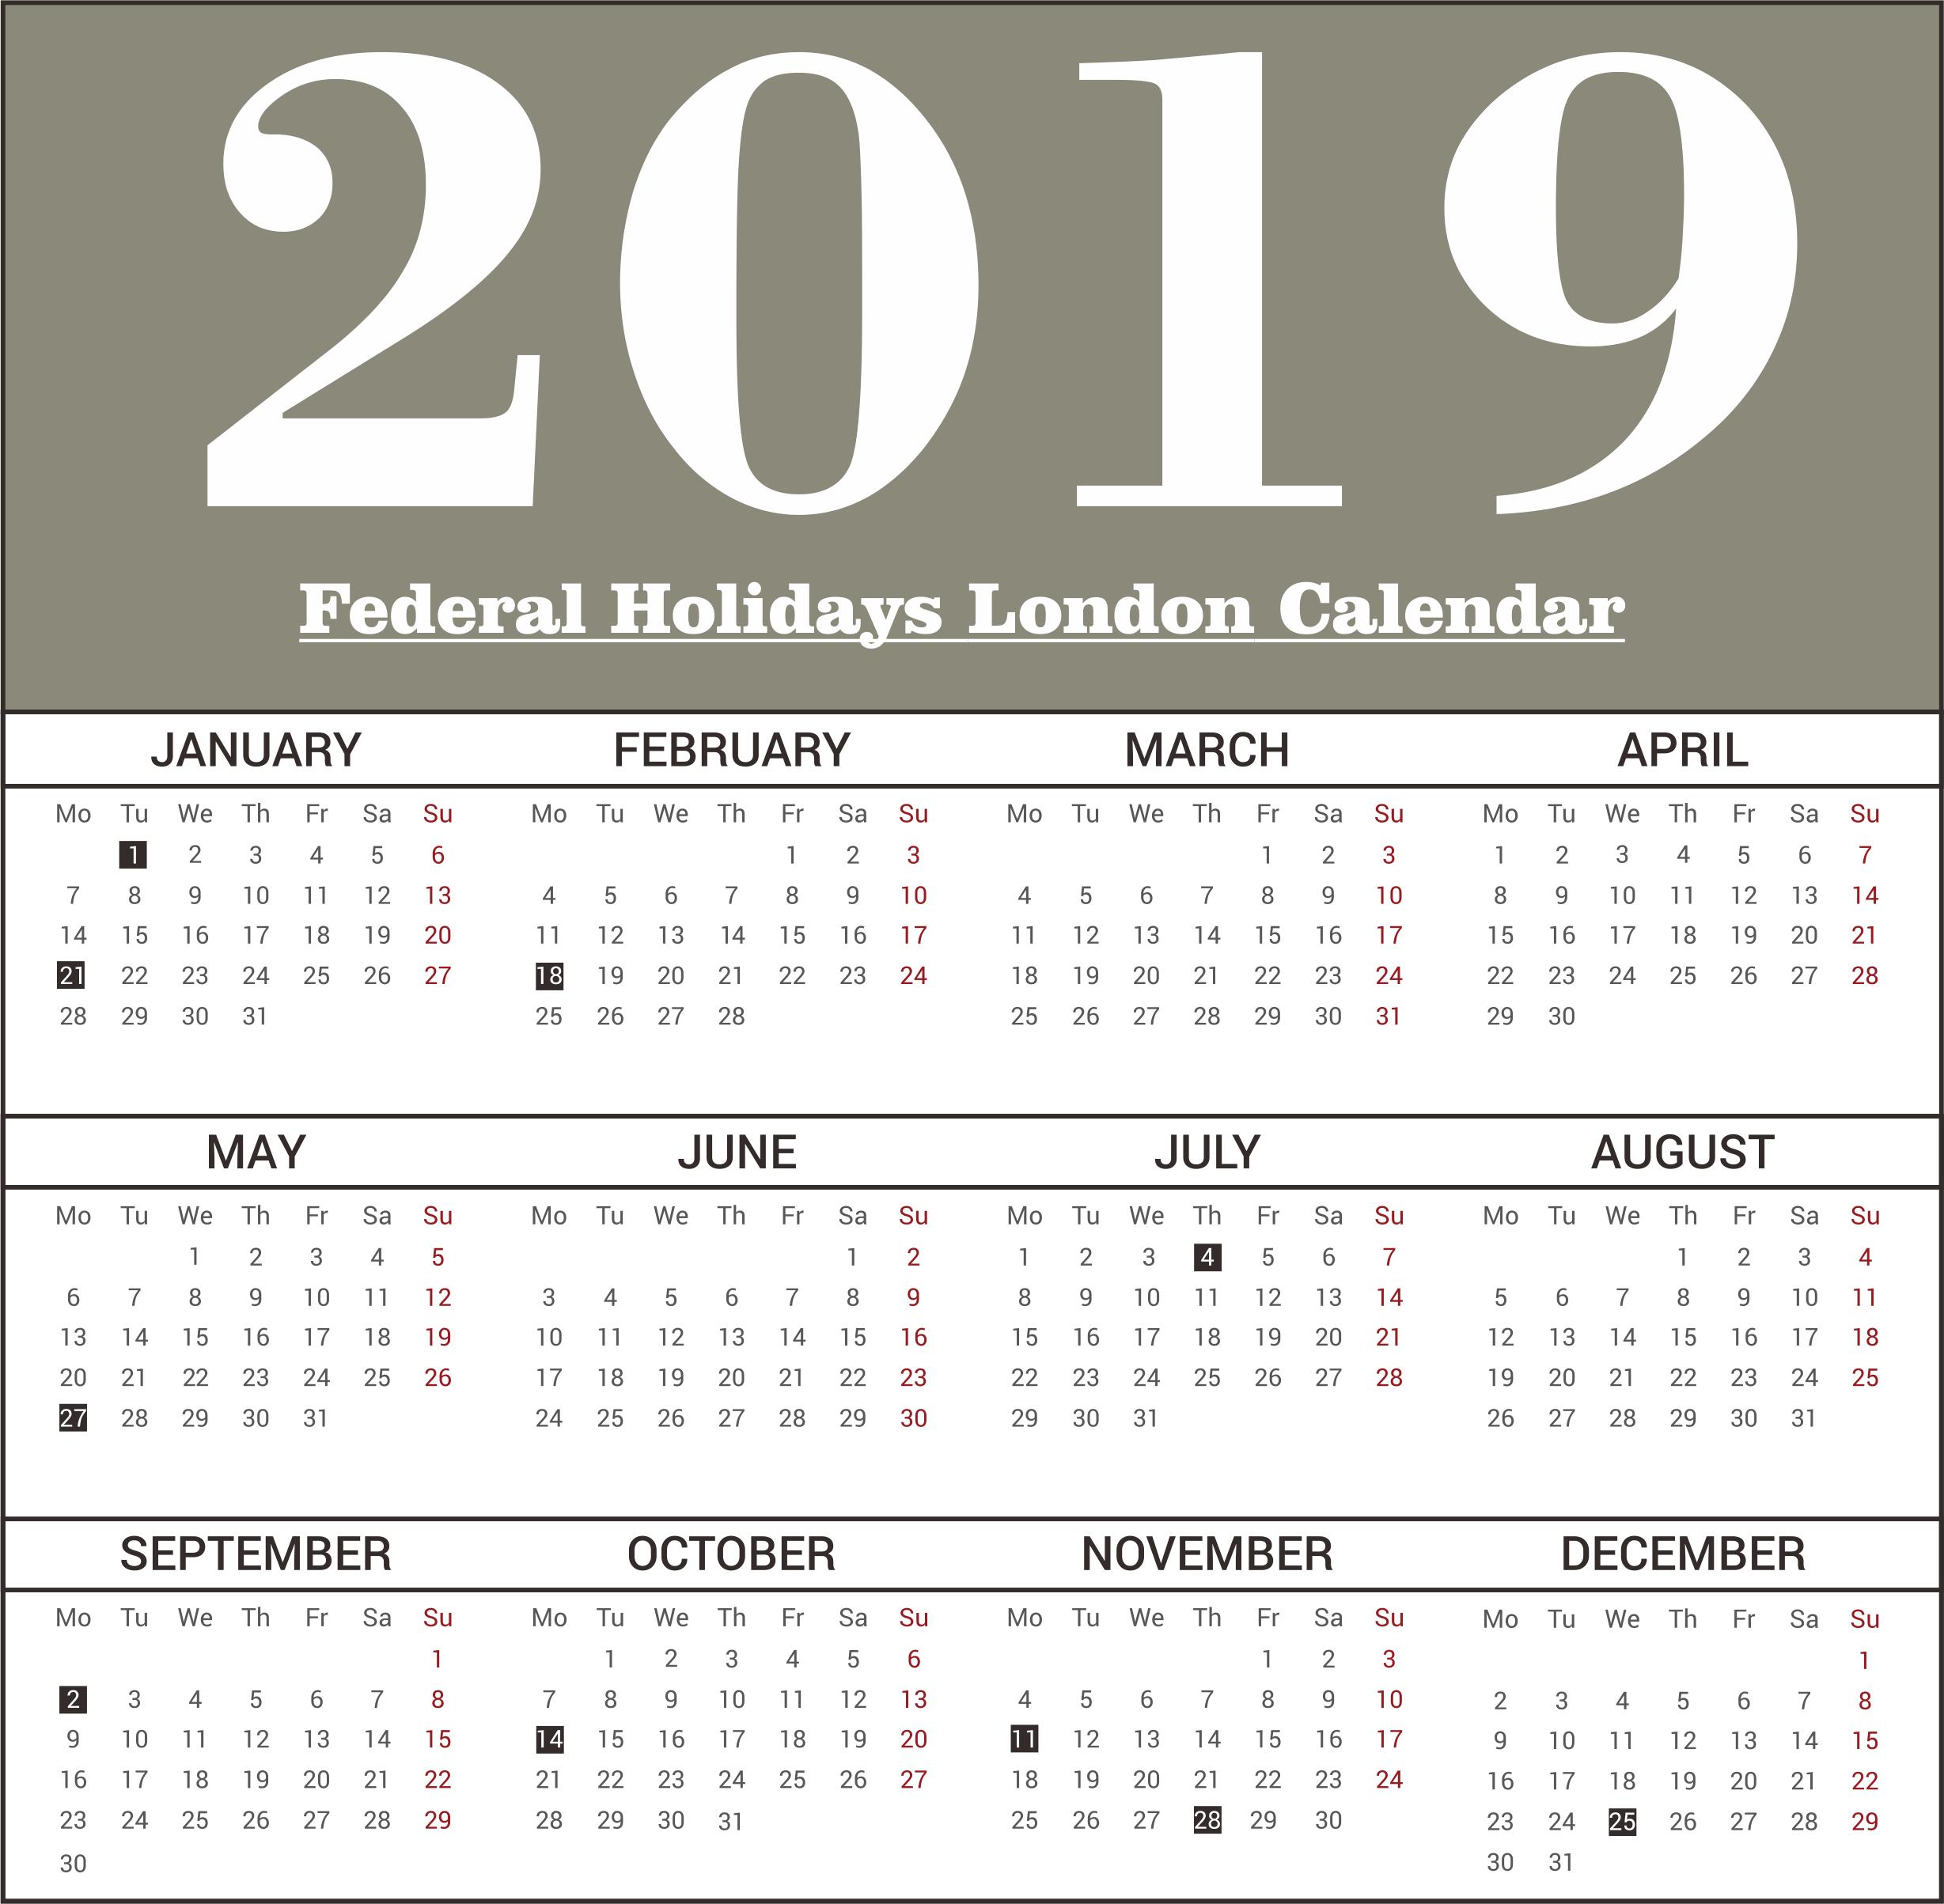 London Federal Holidays 2019 Templates